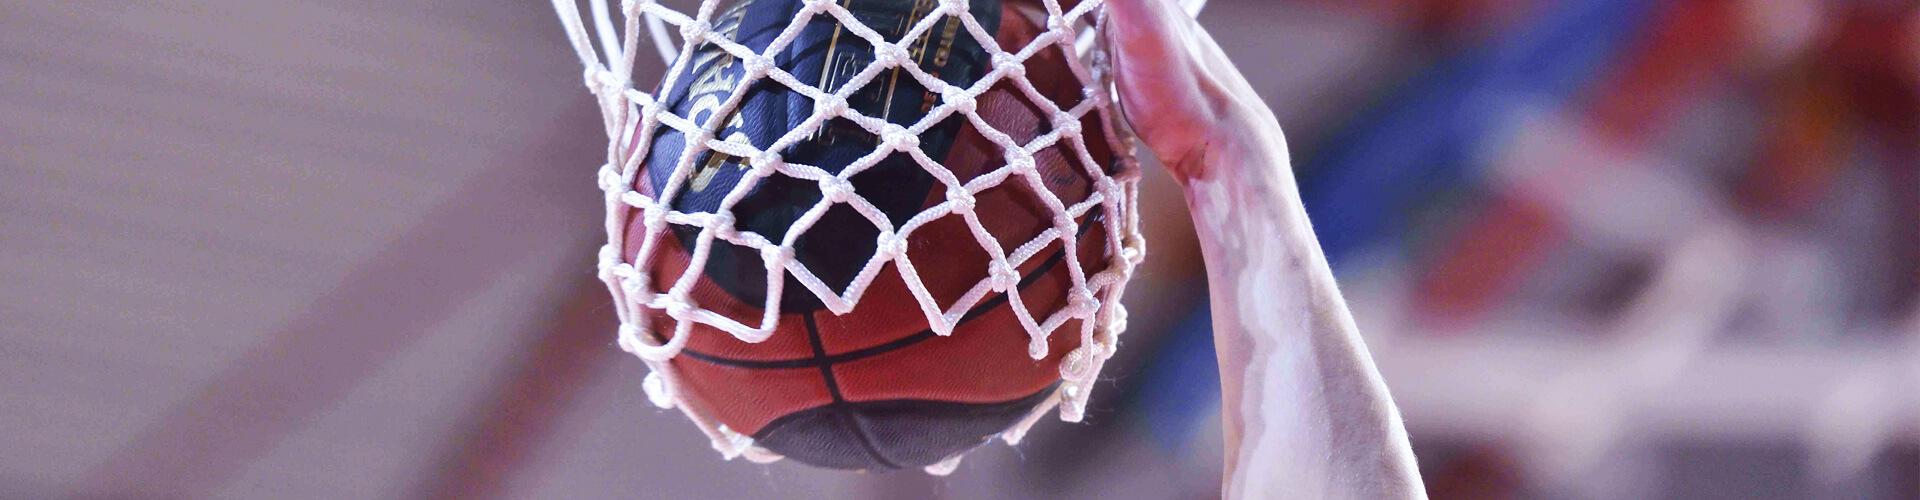 basket-jeune-france-cholet